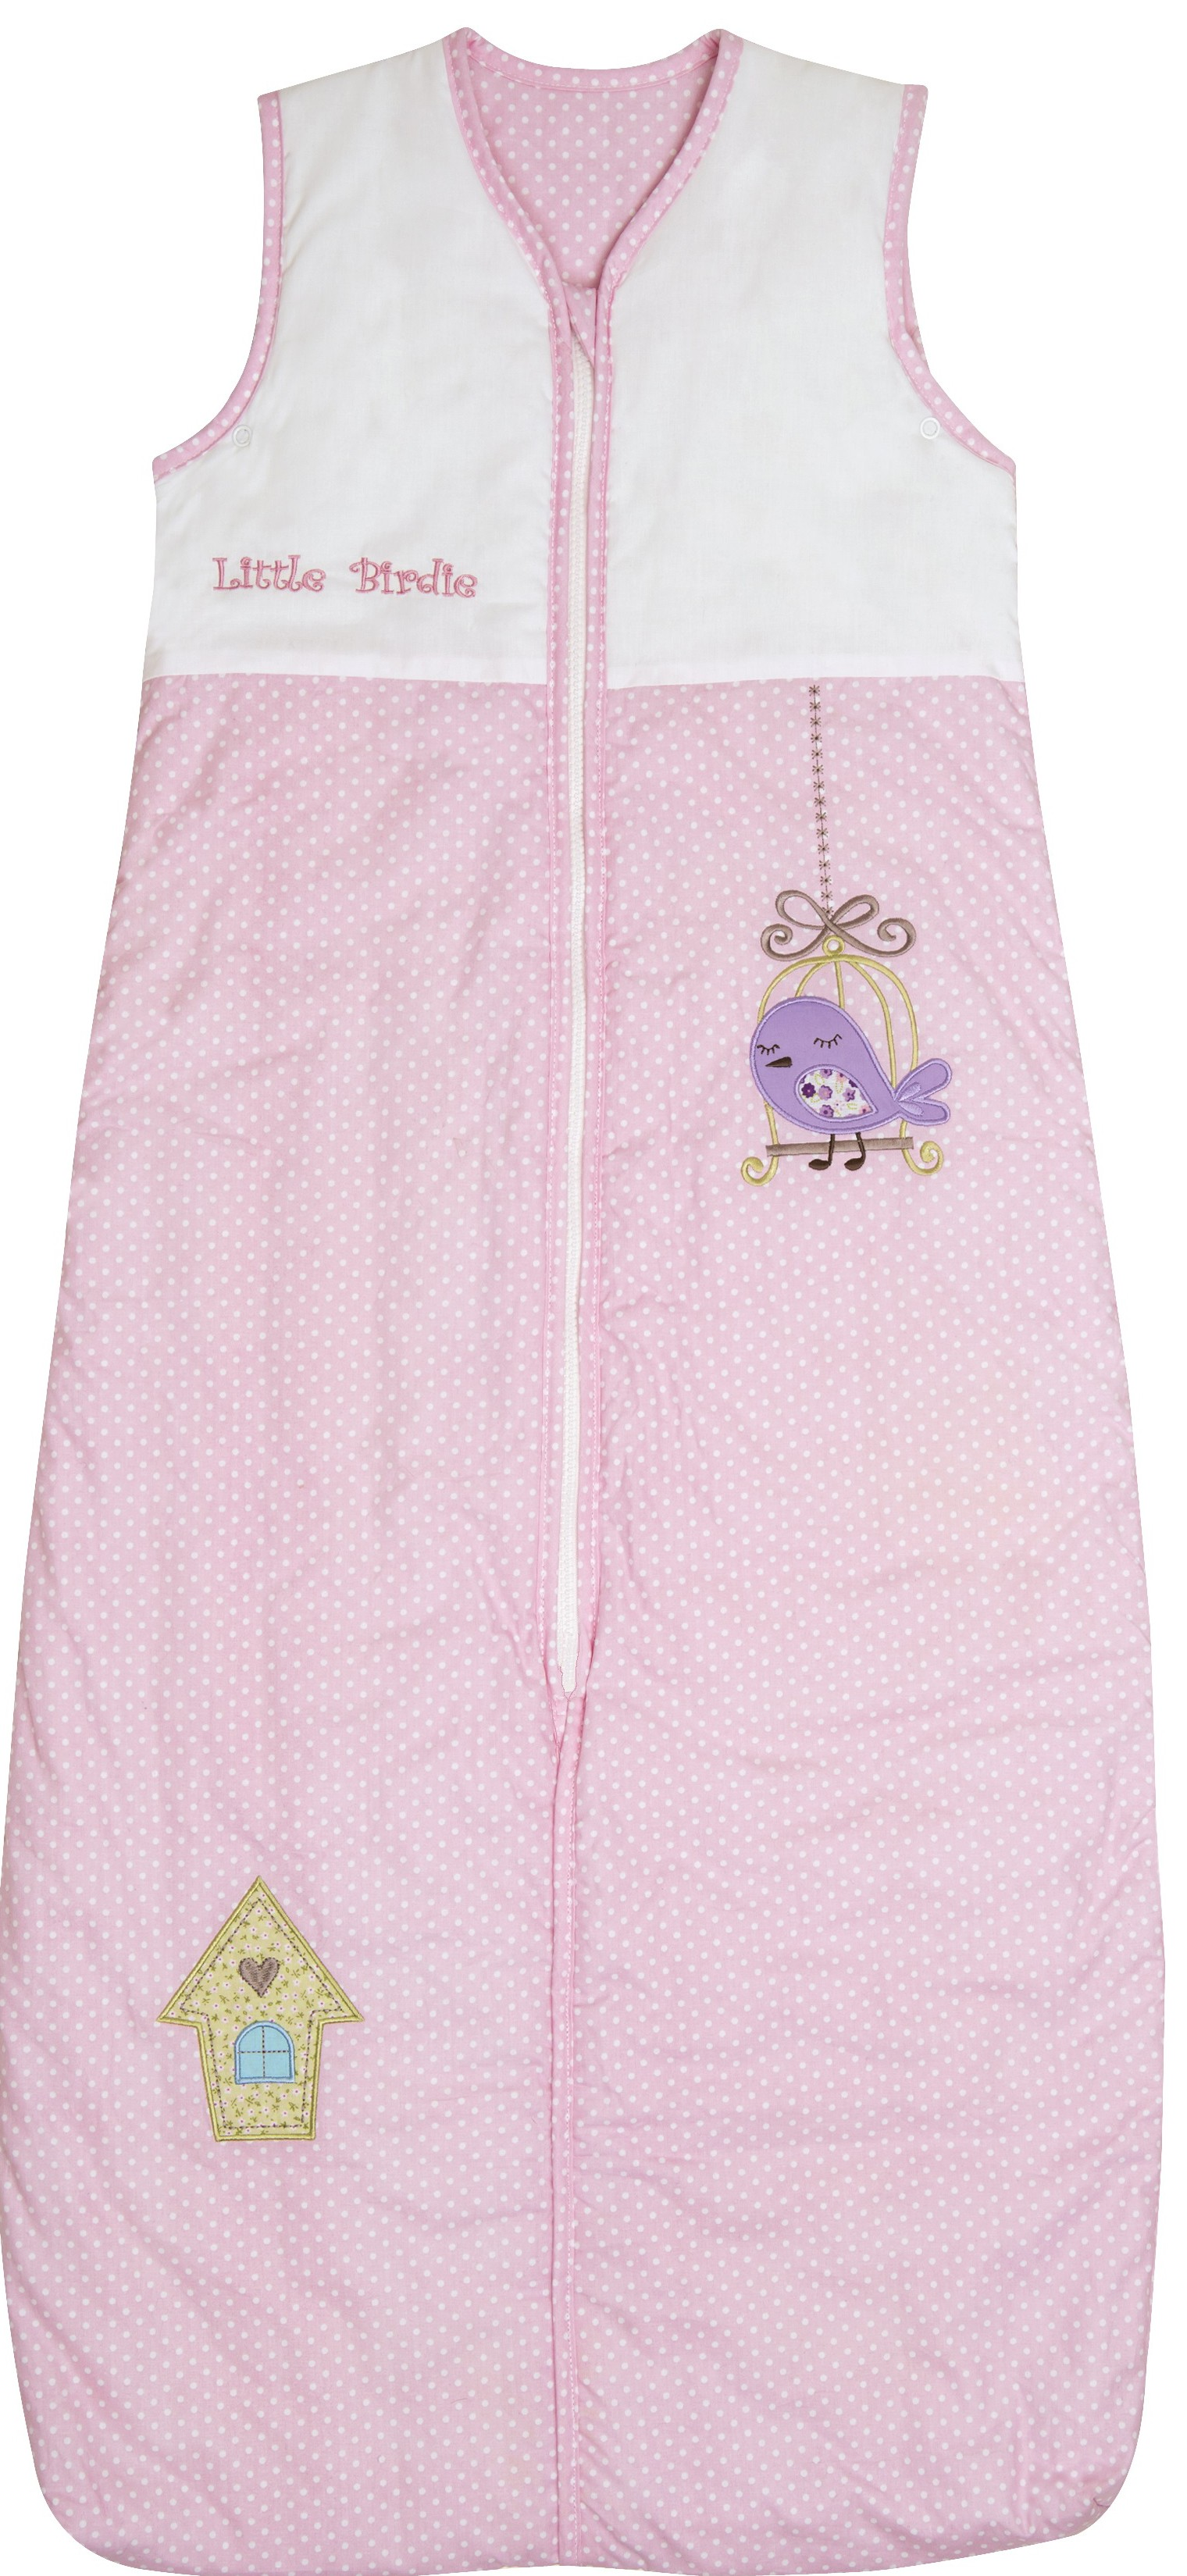 Sac de dormit Pink Bird 1-3 ani 2.5 Tog imagine